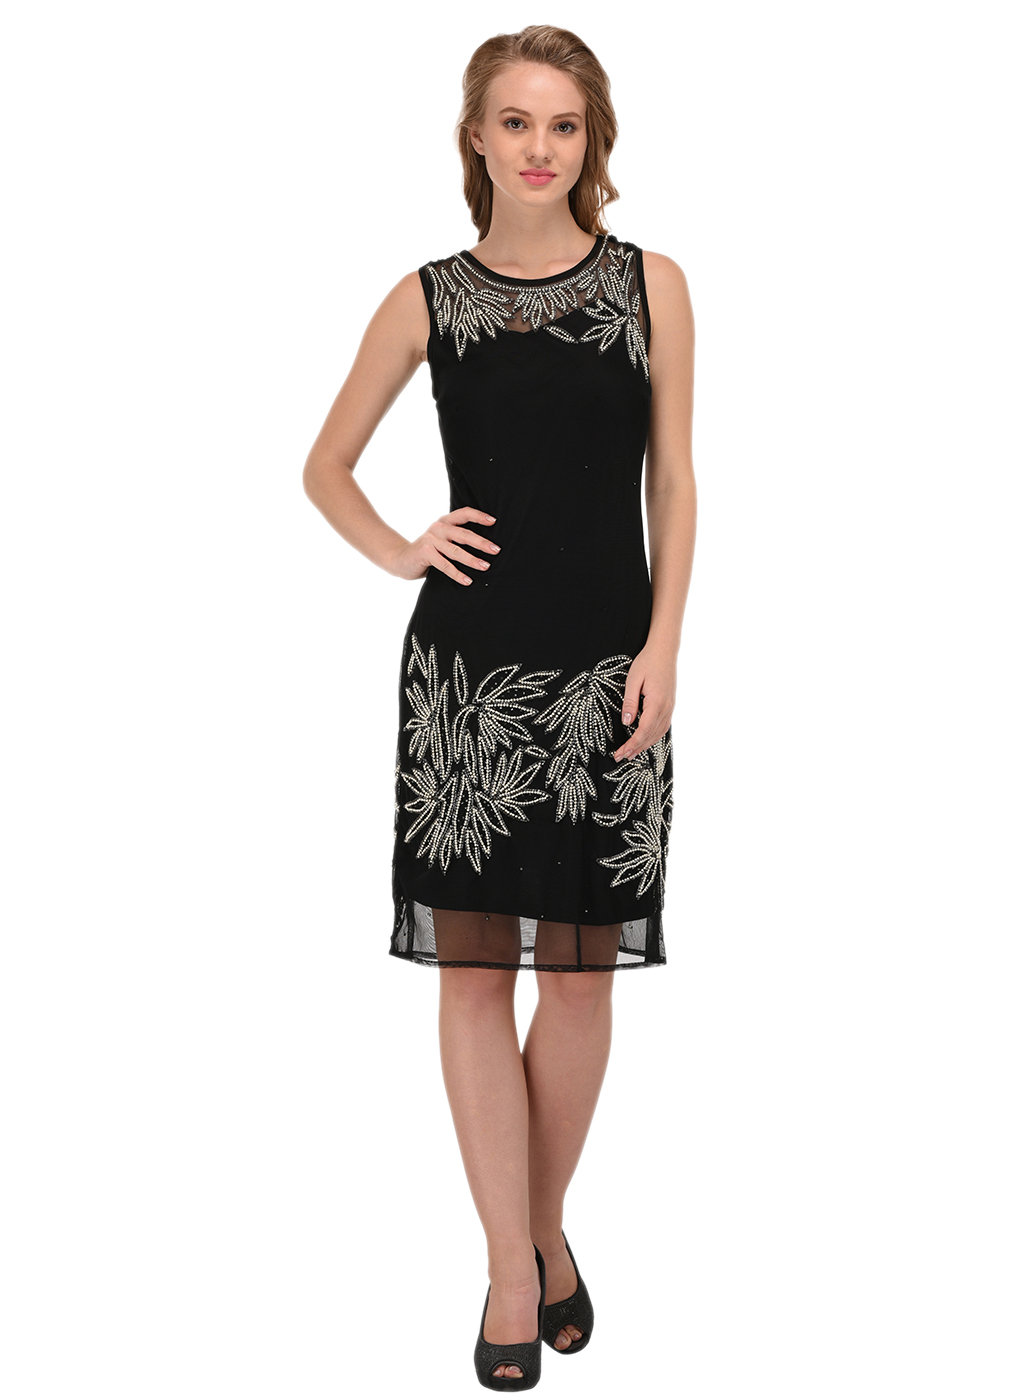 Porsorte | PORSORTE Women A-Line Embellished Black Dress